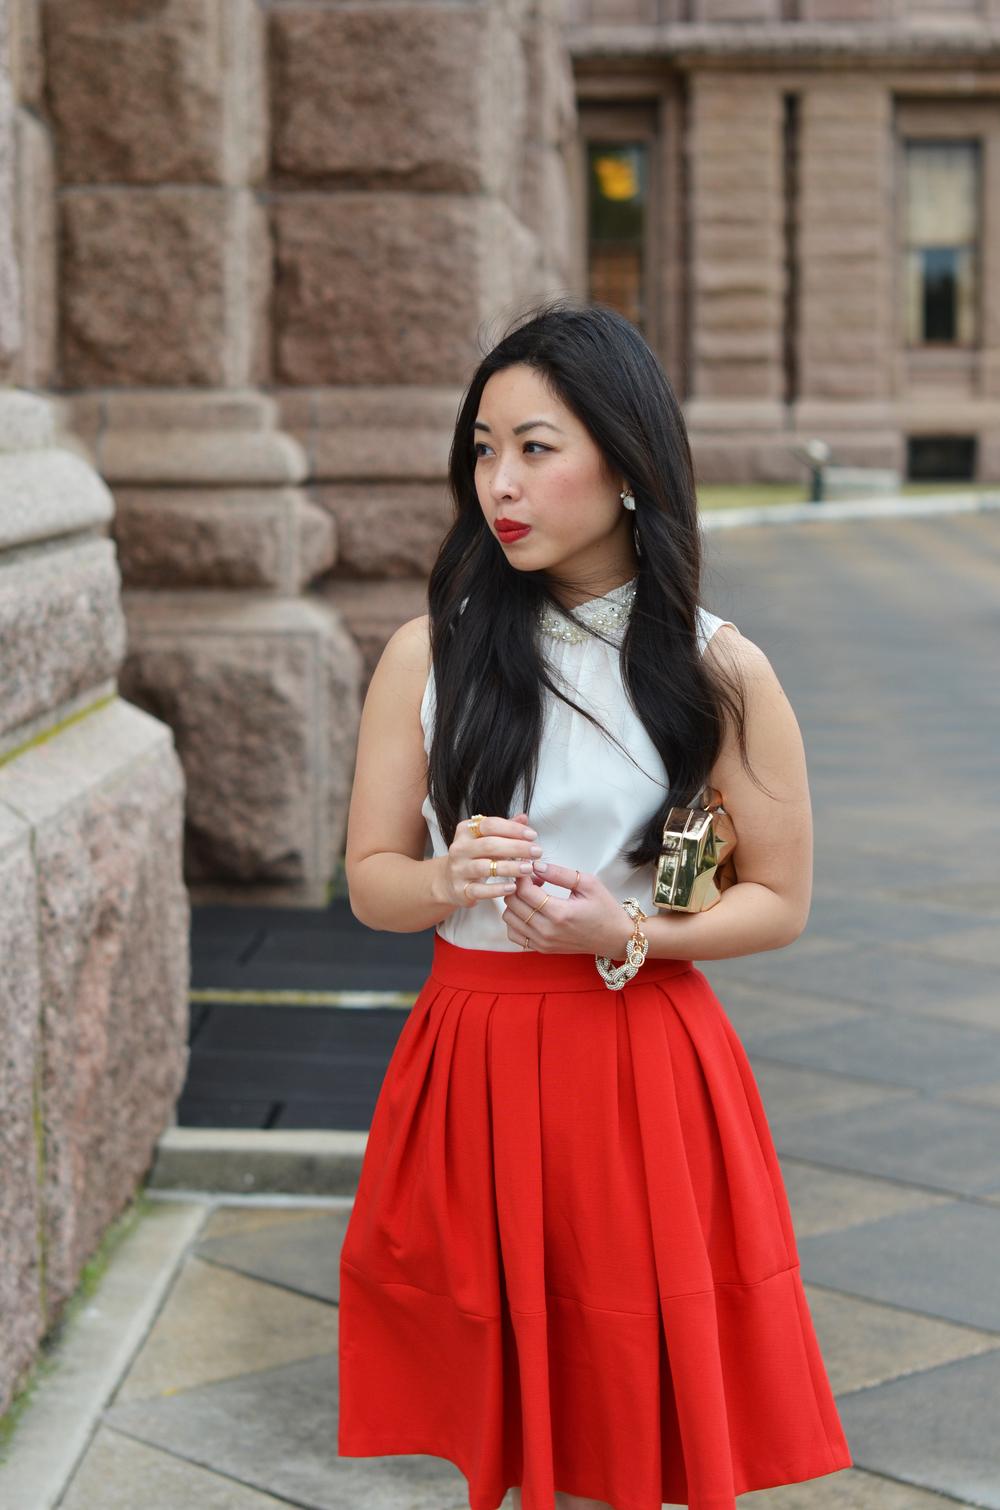 the red skirt & pearls -- jannadoan.com